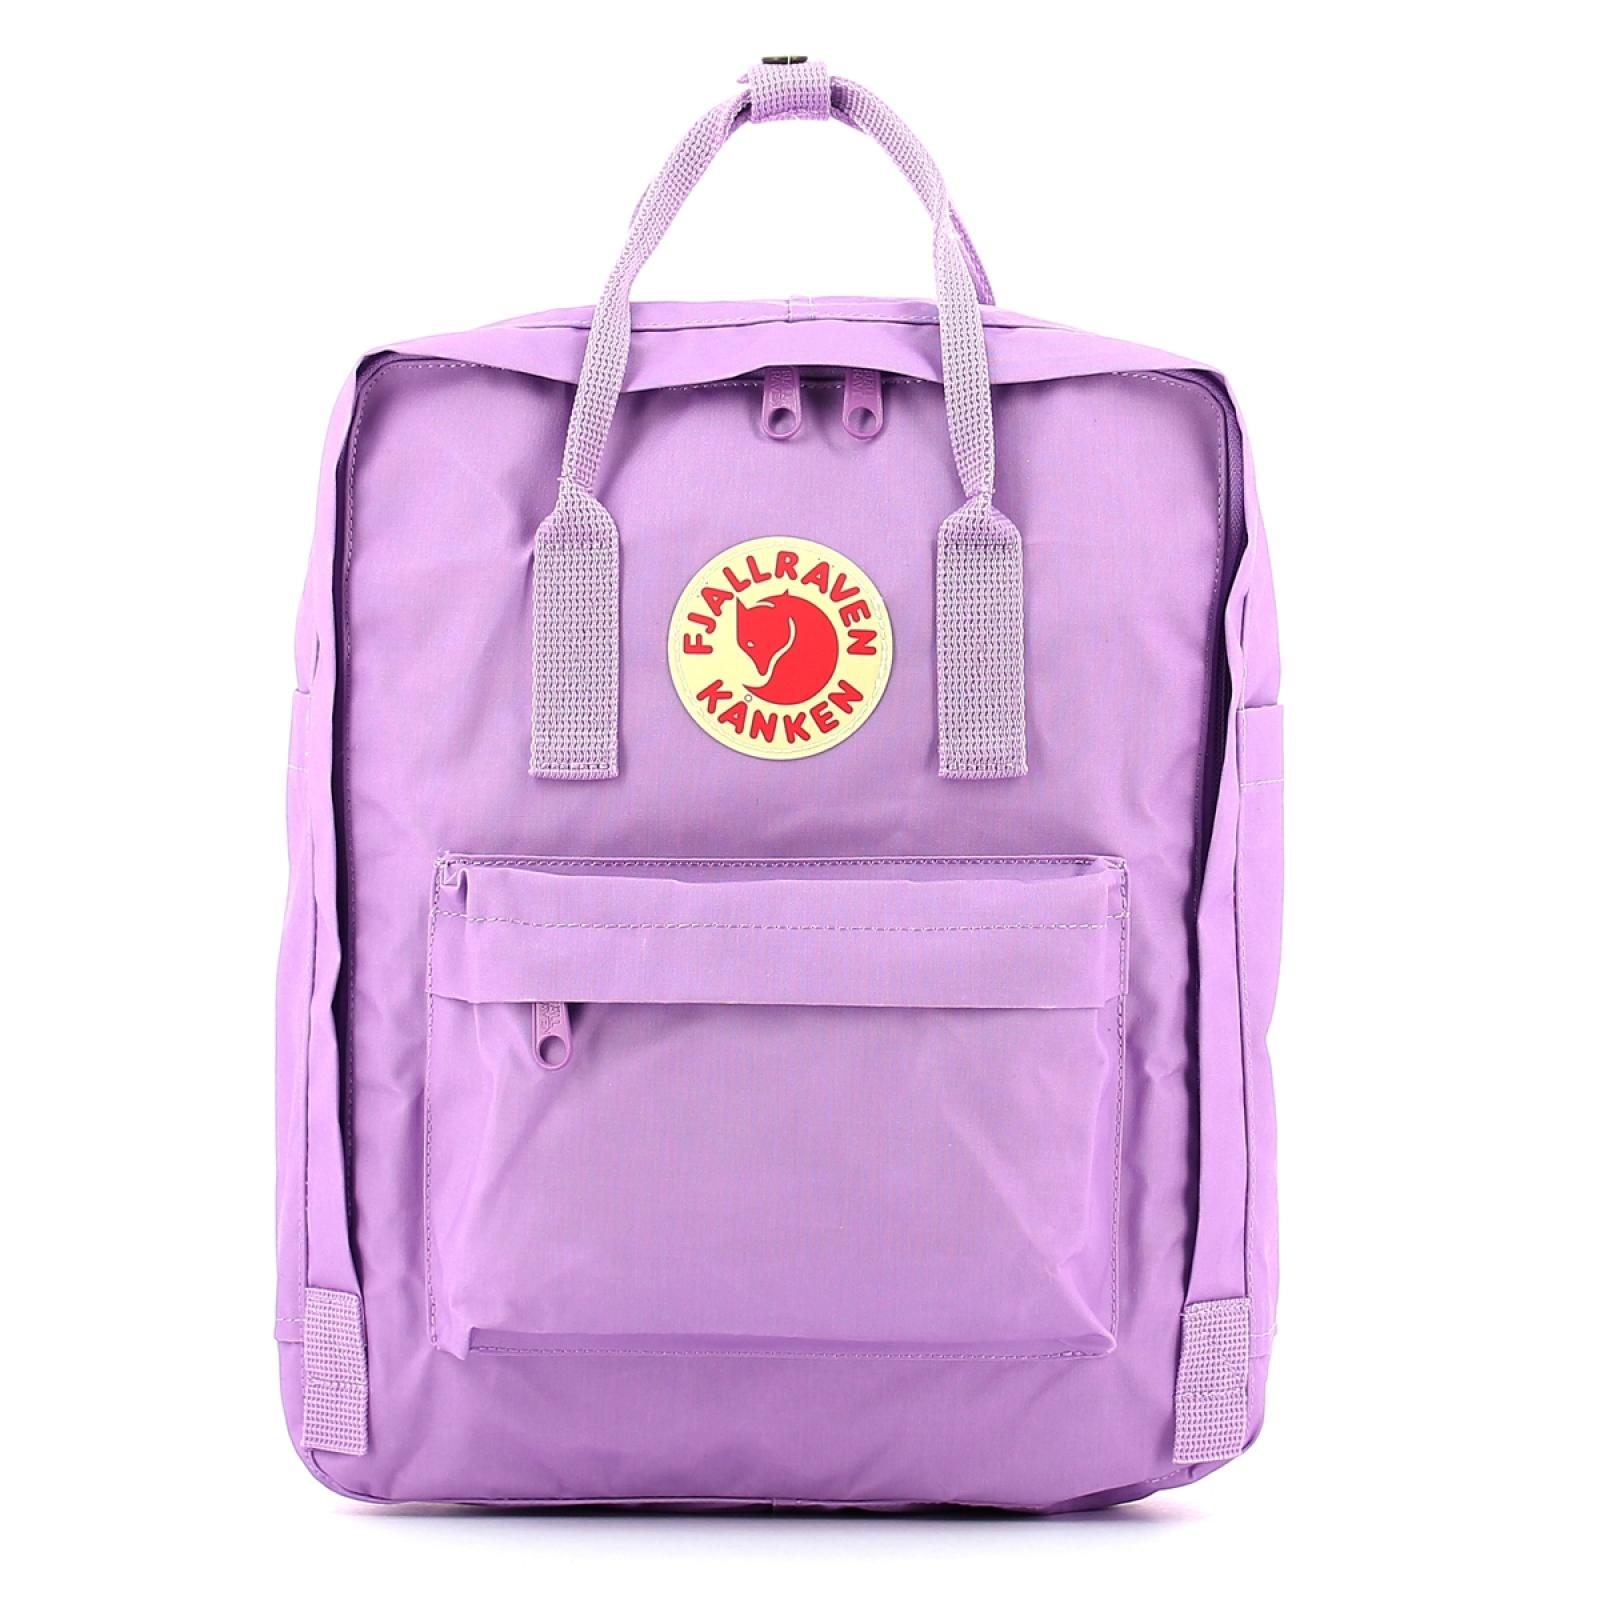 Backpack Kånken-ORCHID-UN